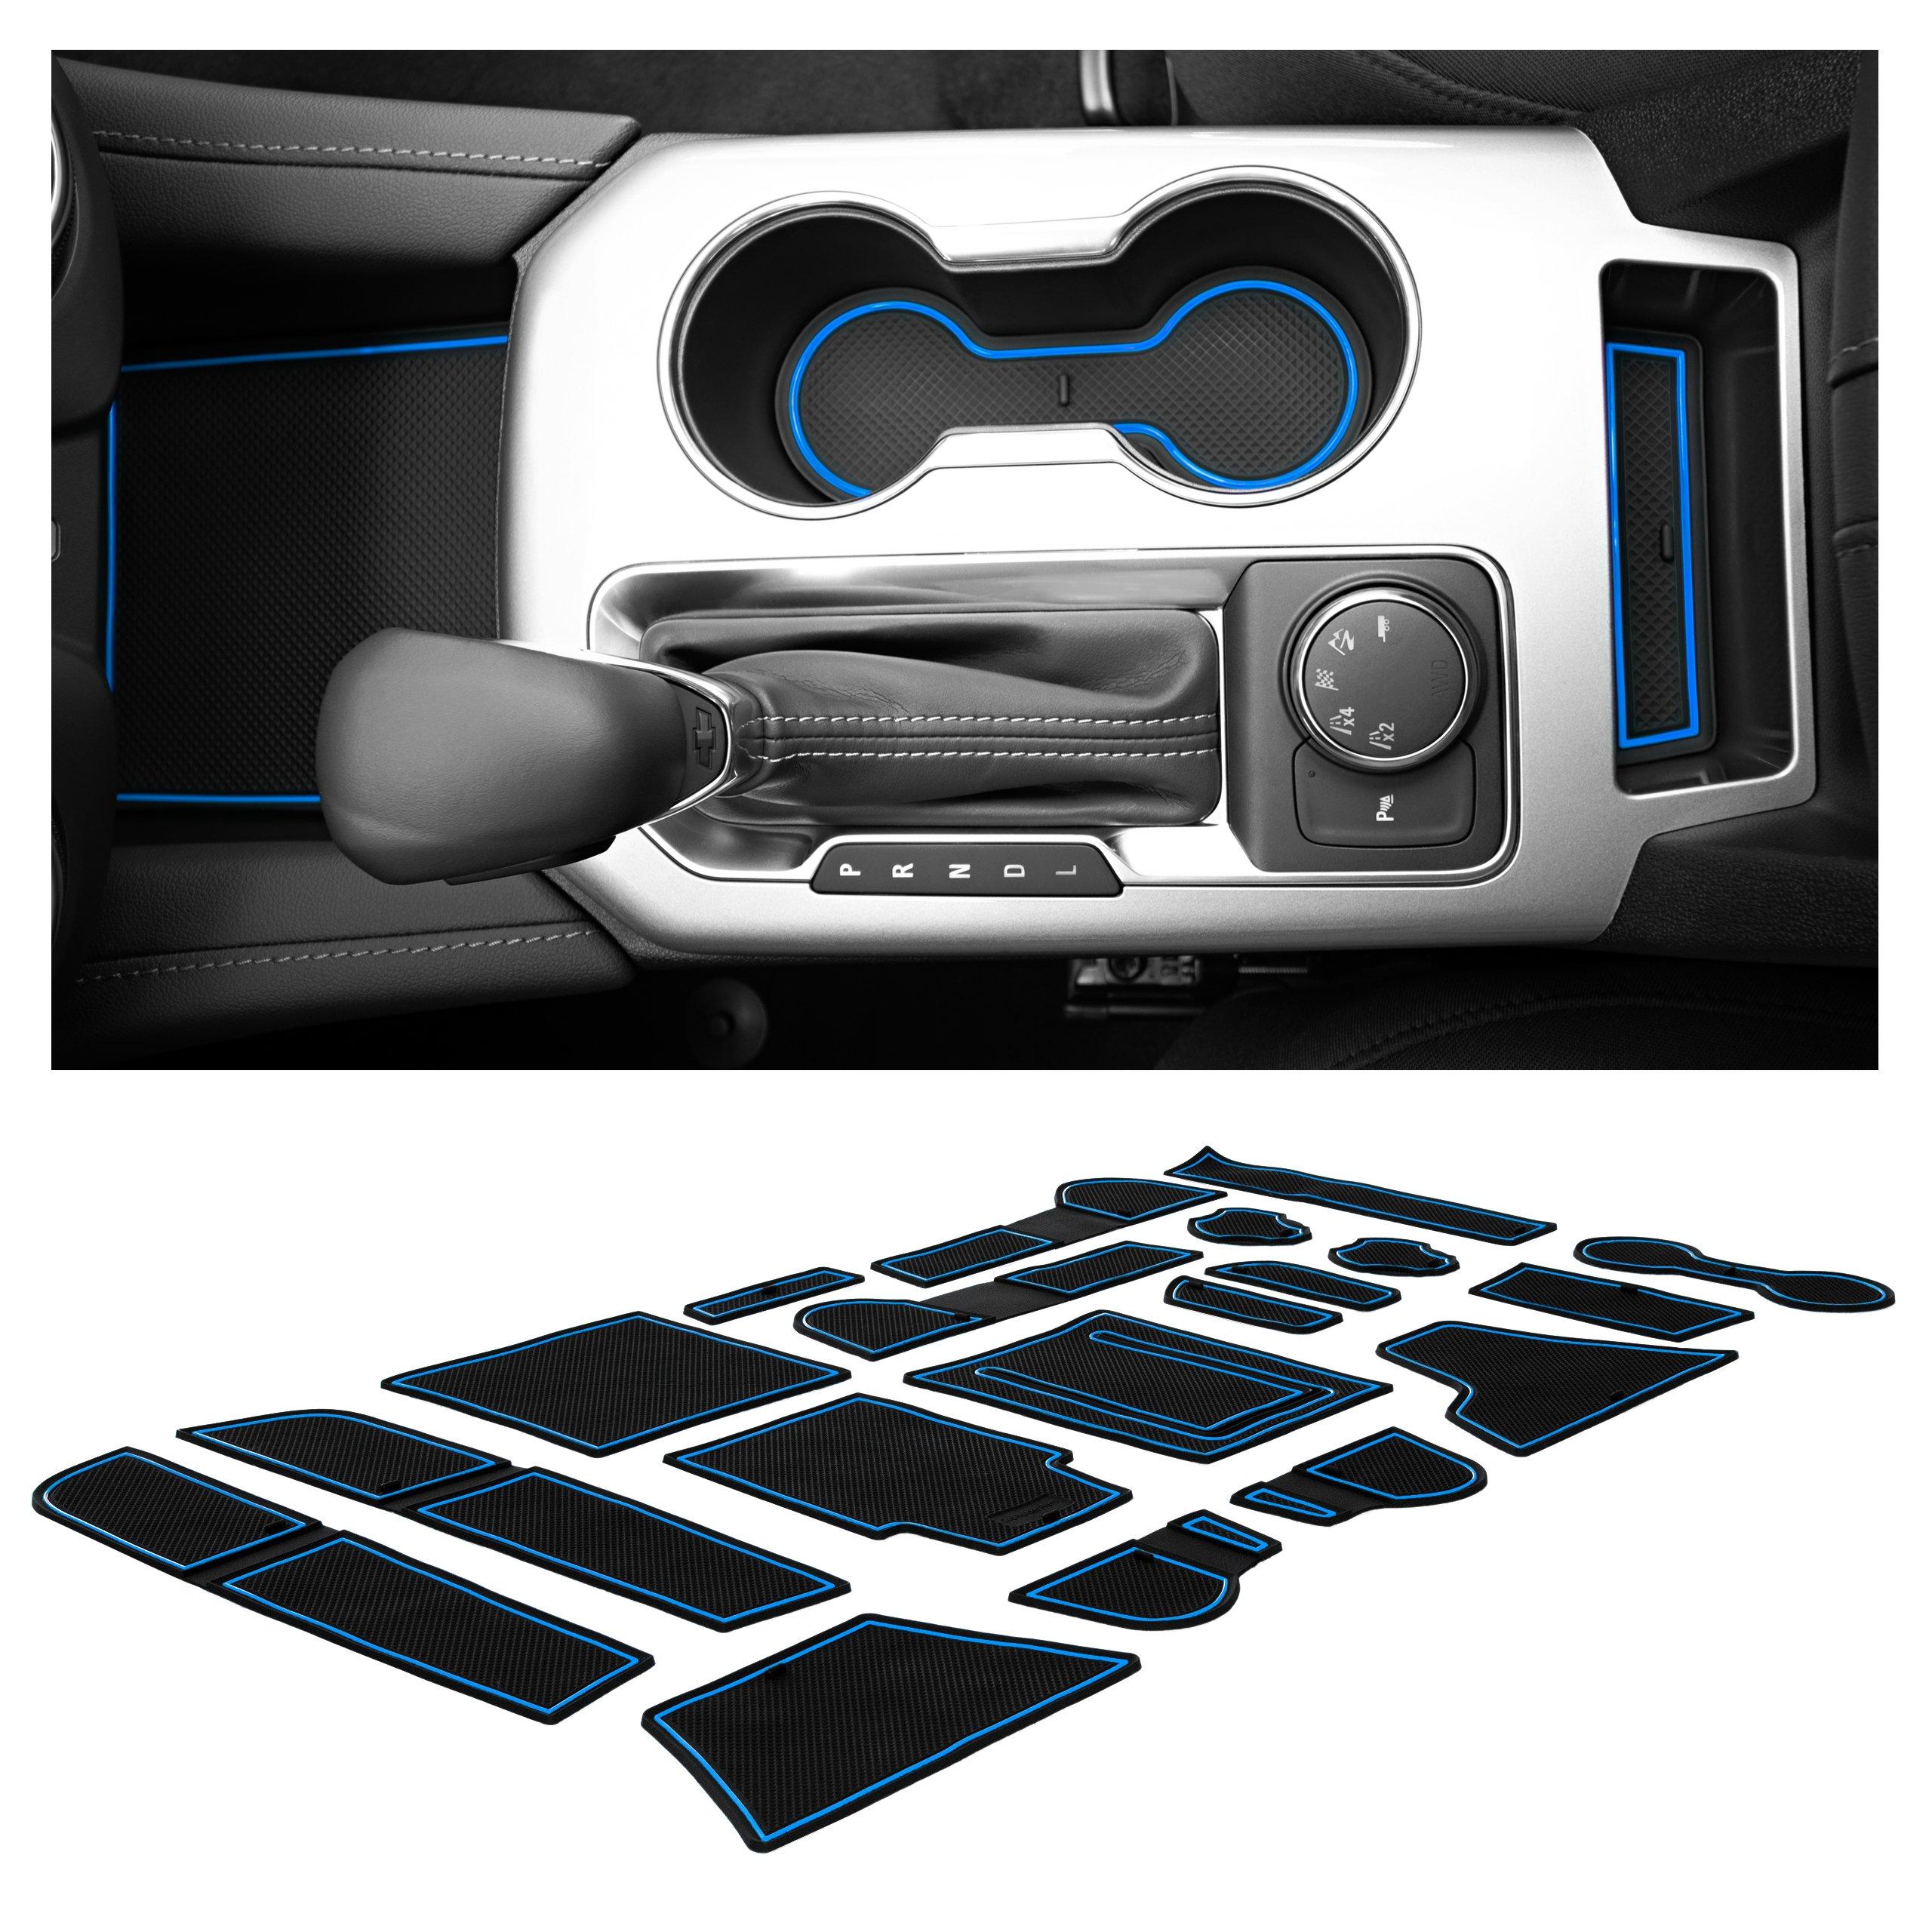 CupHolderHero-Chevy-Blazer-2019-2021-Liner-Accessories thumbnail 7